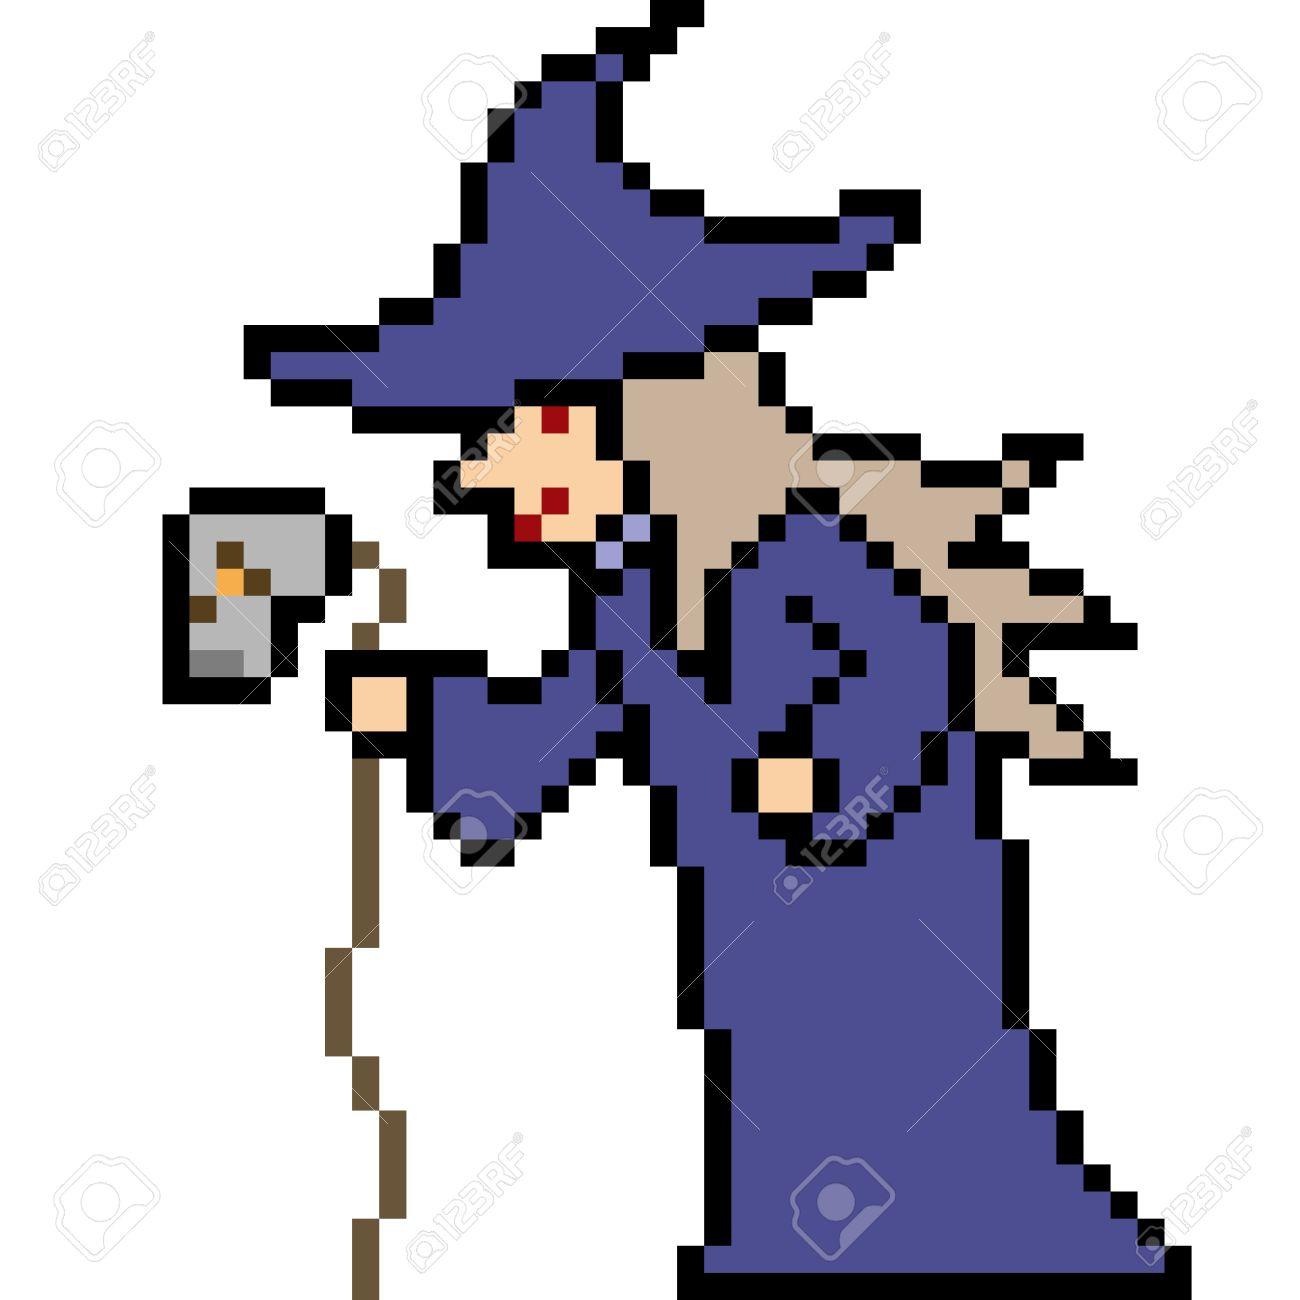 Pixel Art Halloween Sorcière Isolé